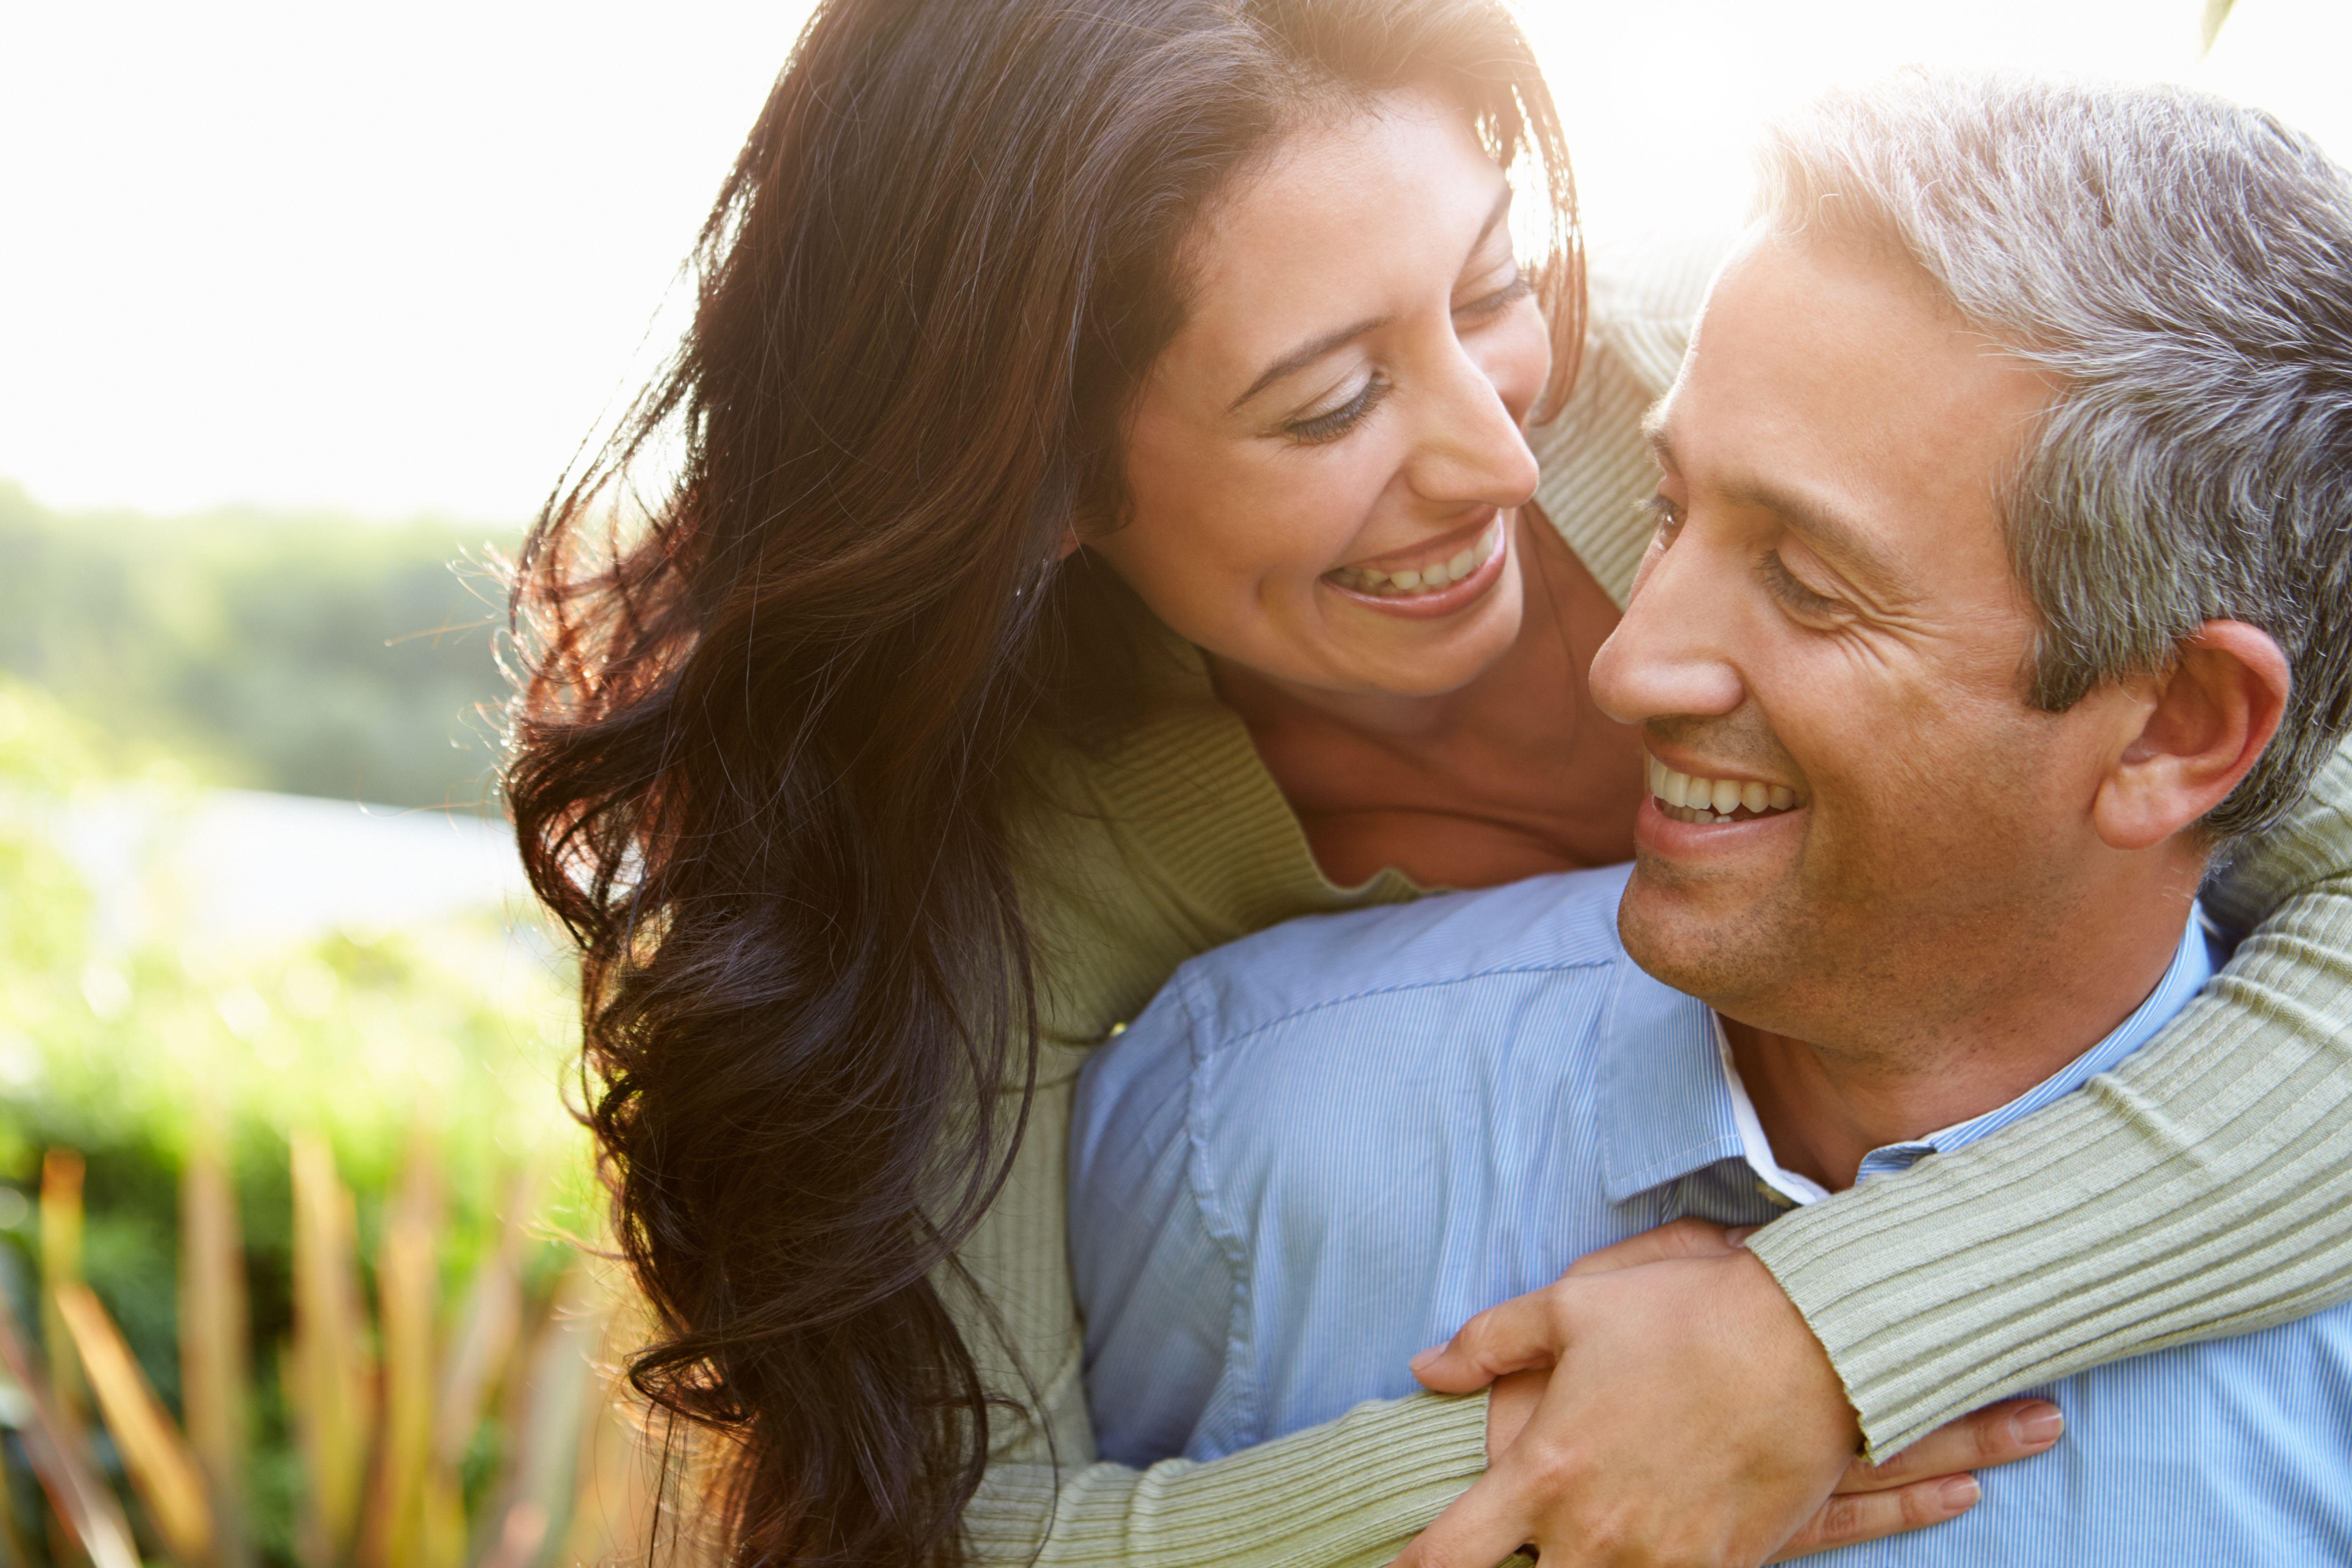 Woman hugging man, both smiling with healthy-looking teeth